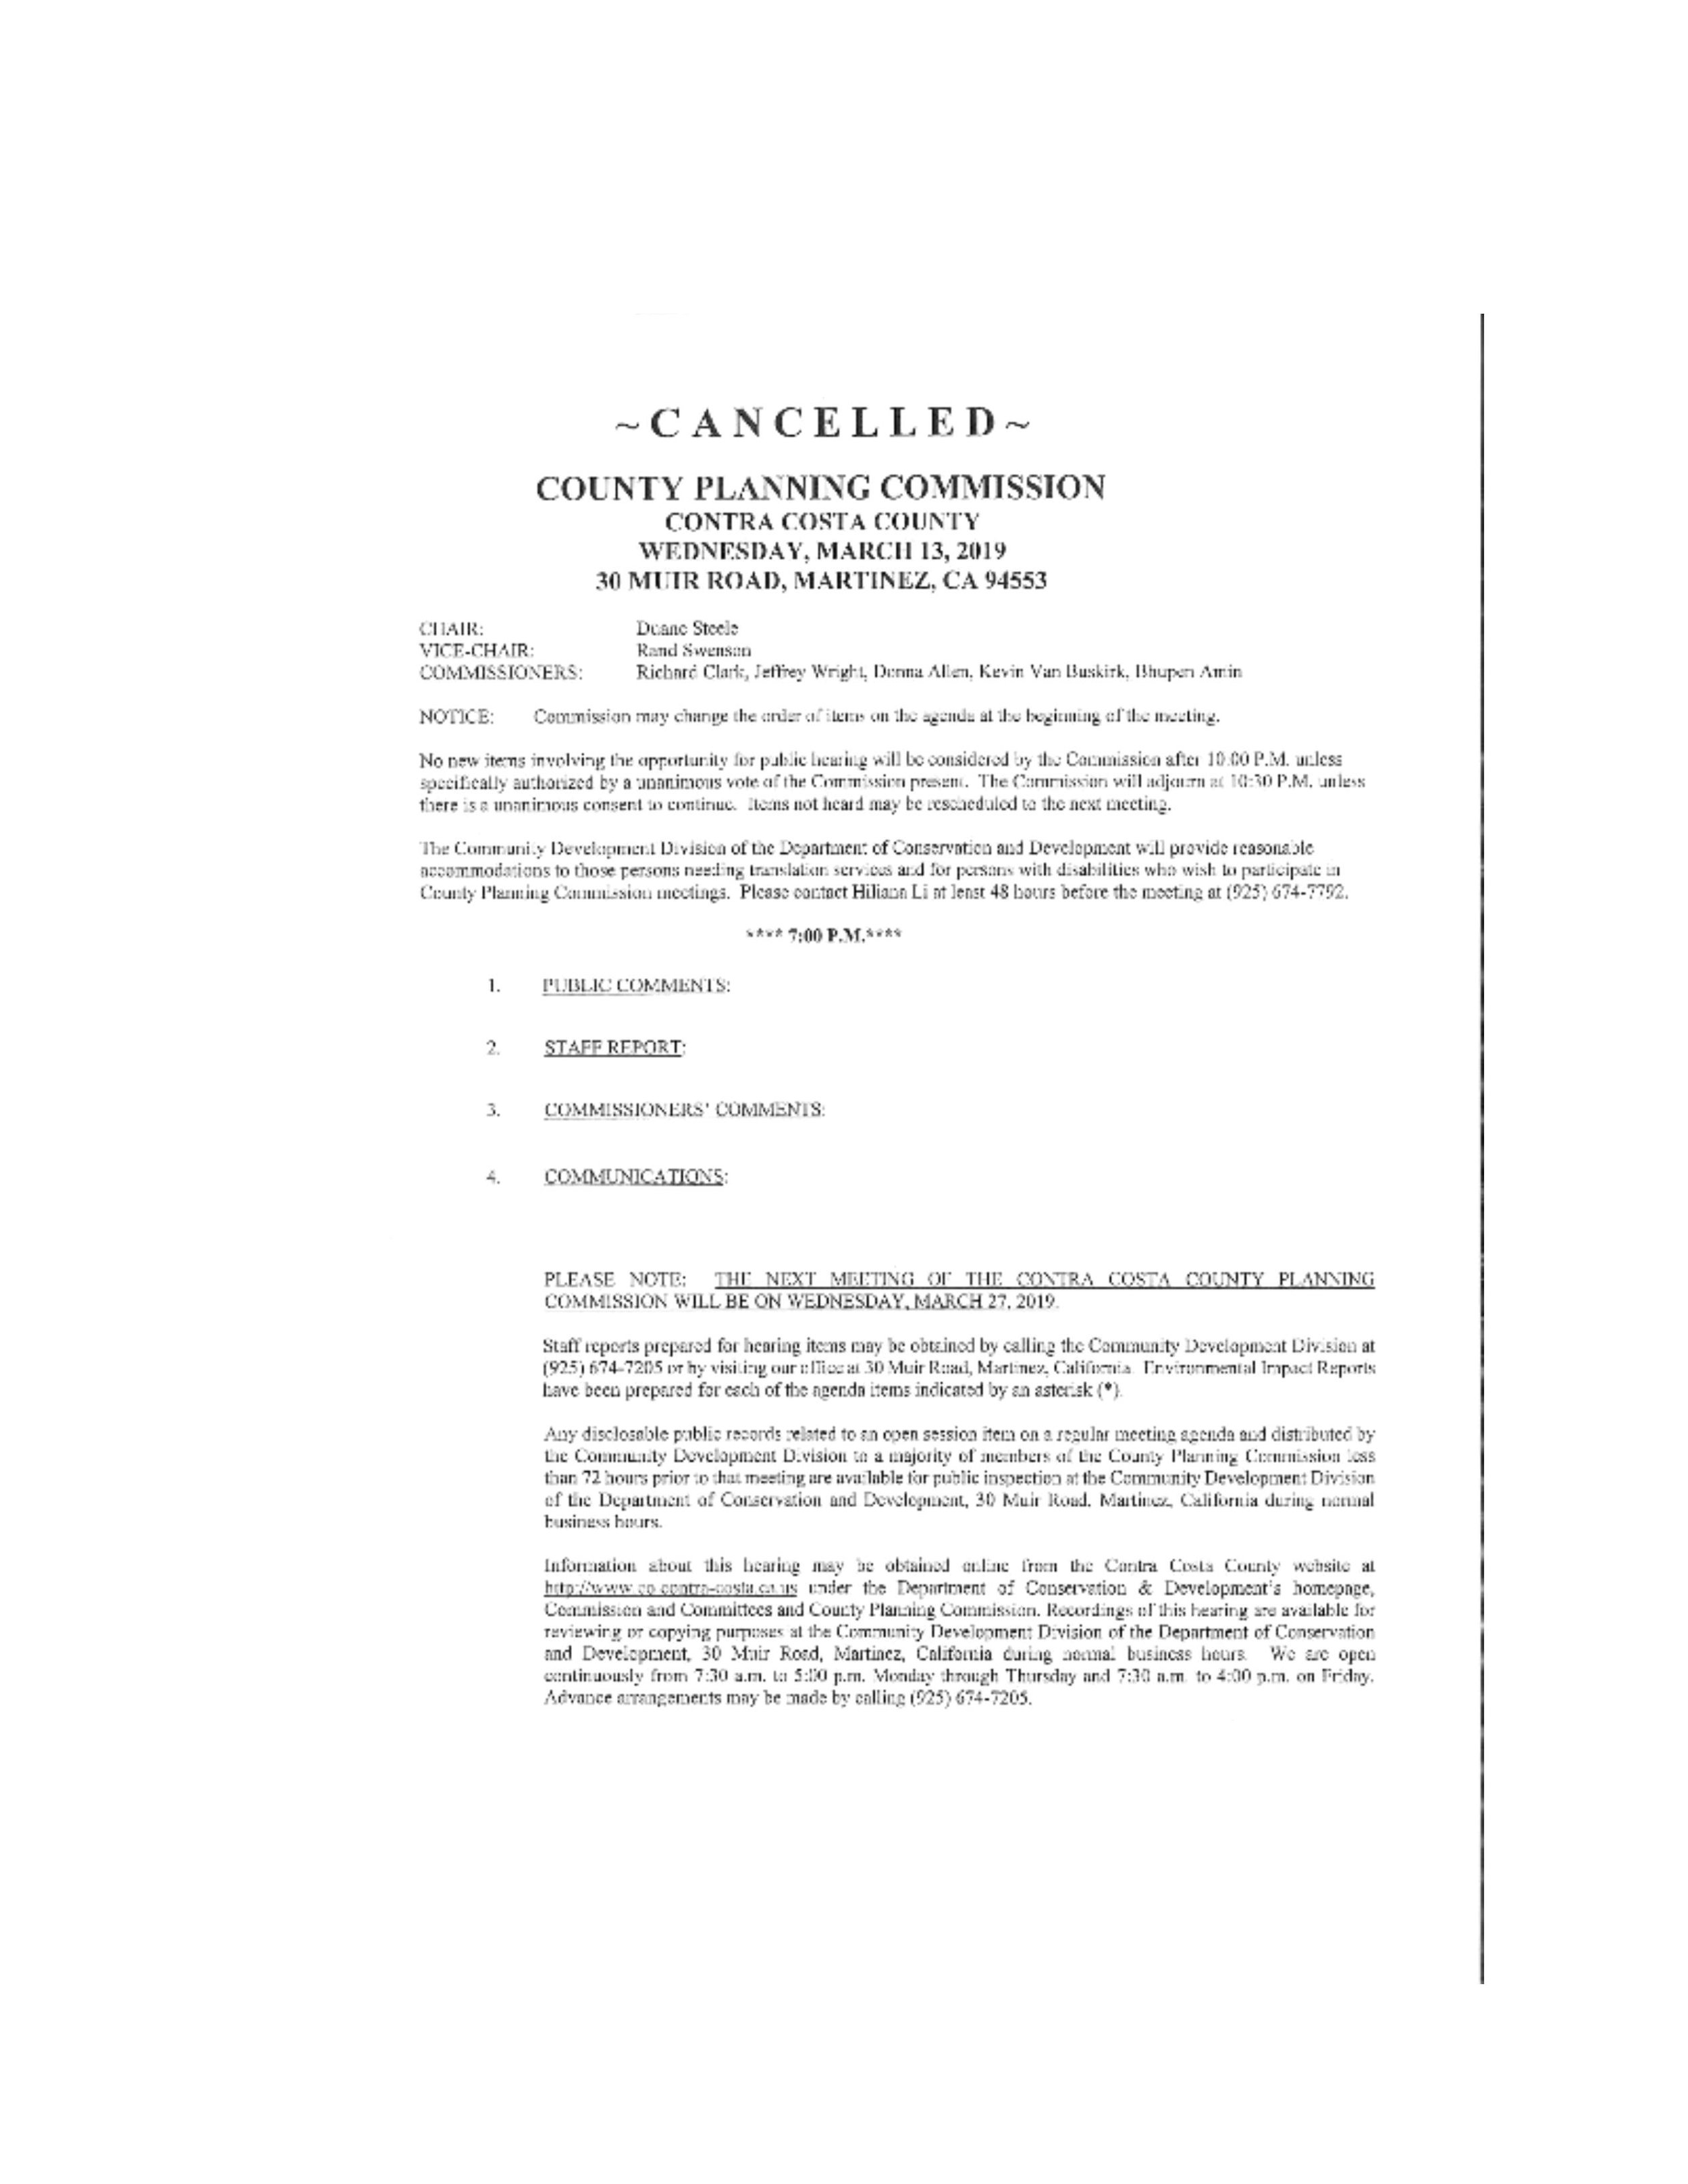 ESMAC Agenda 3.13.2019 (8 Pages)_6.jpg